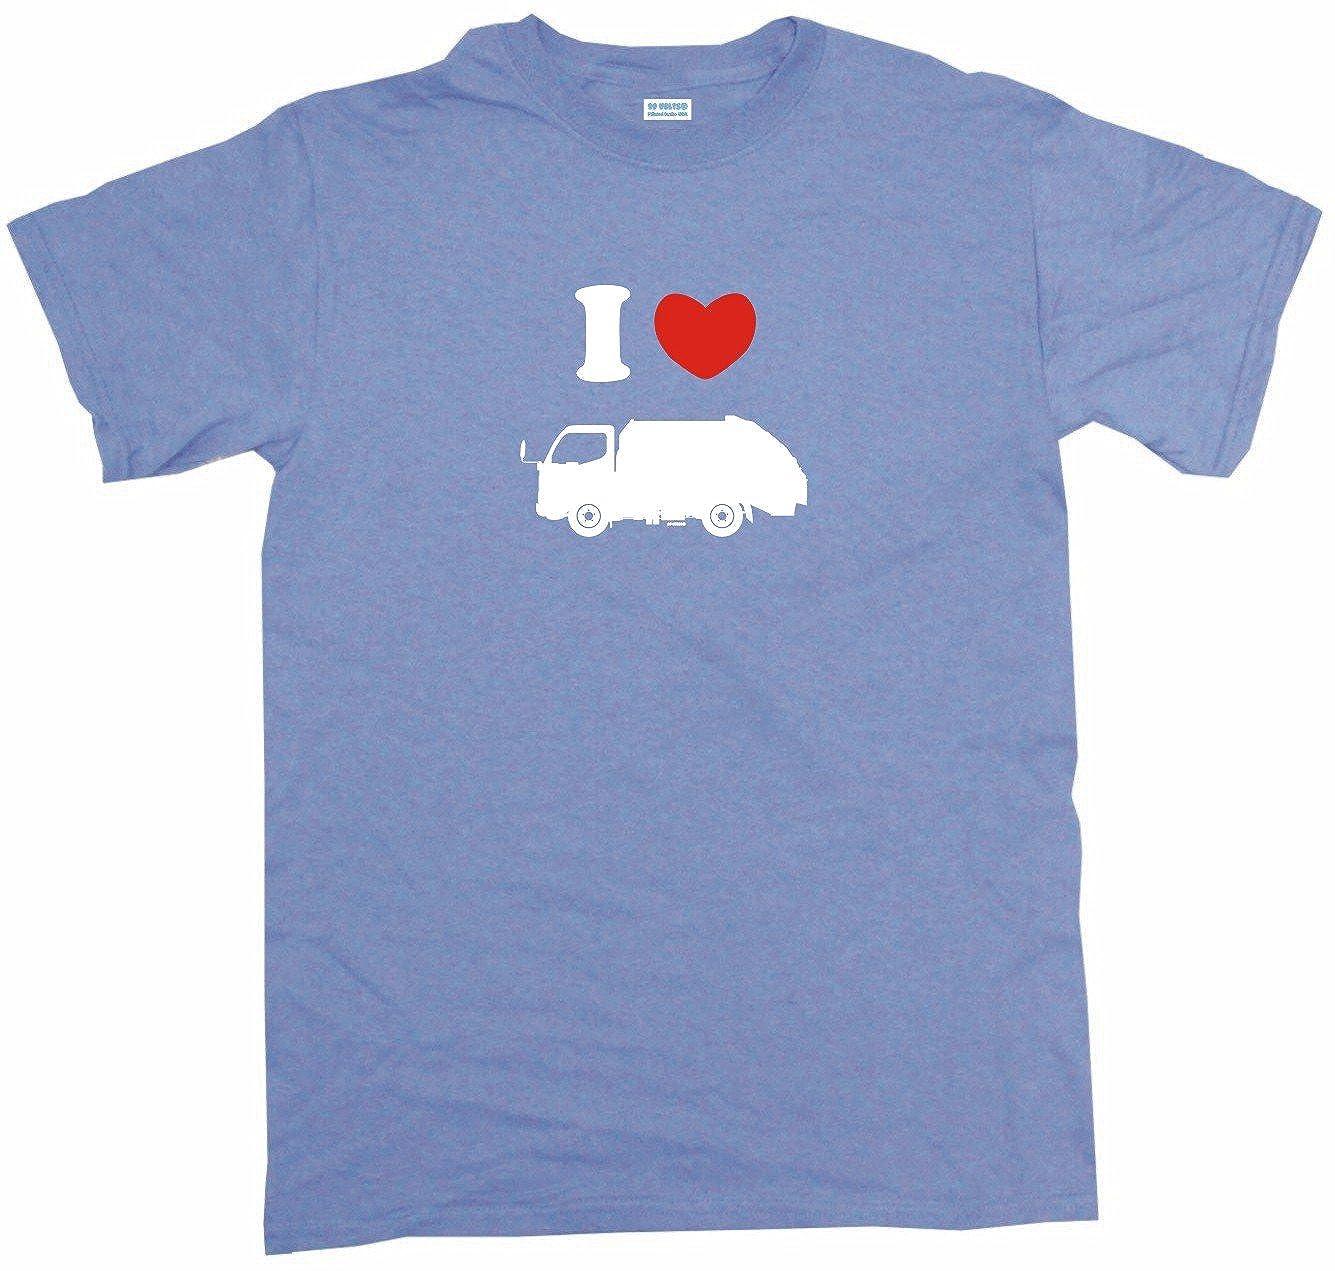 I Heart Love Garbage Truck Little Boy's Kids Tee Shirt